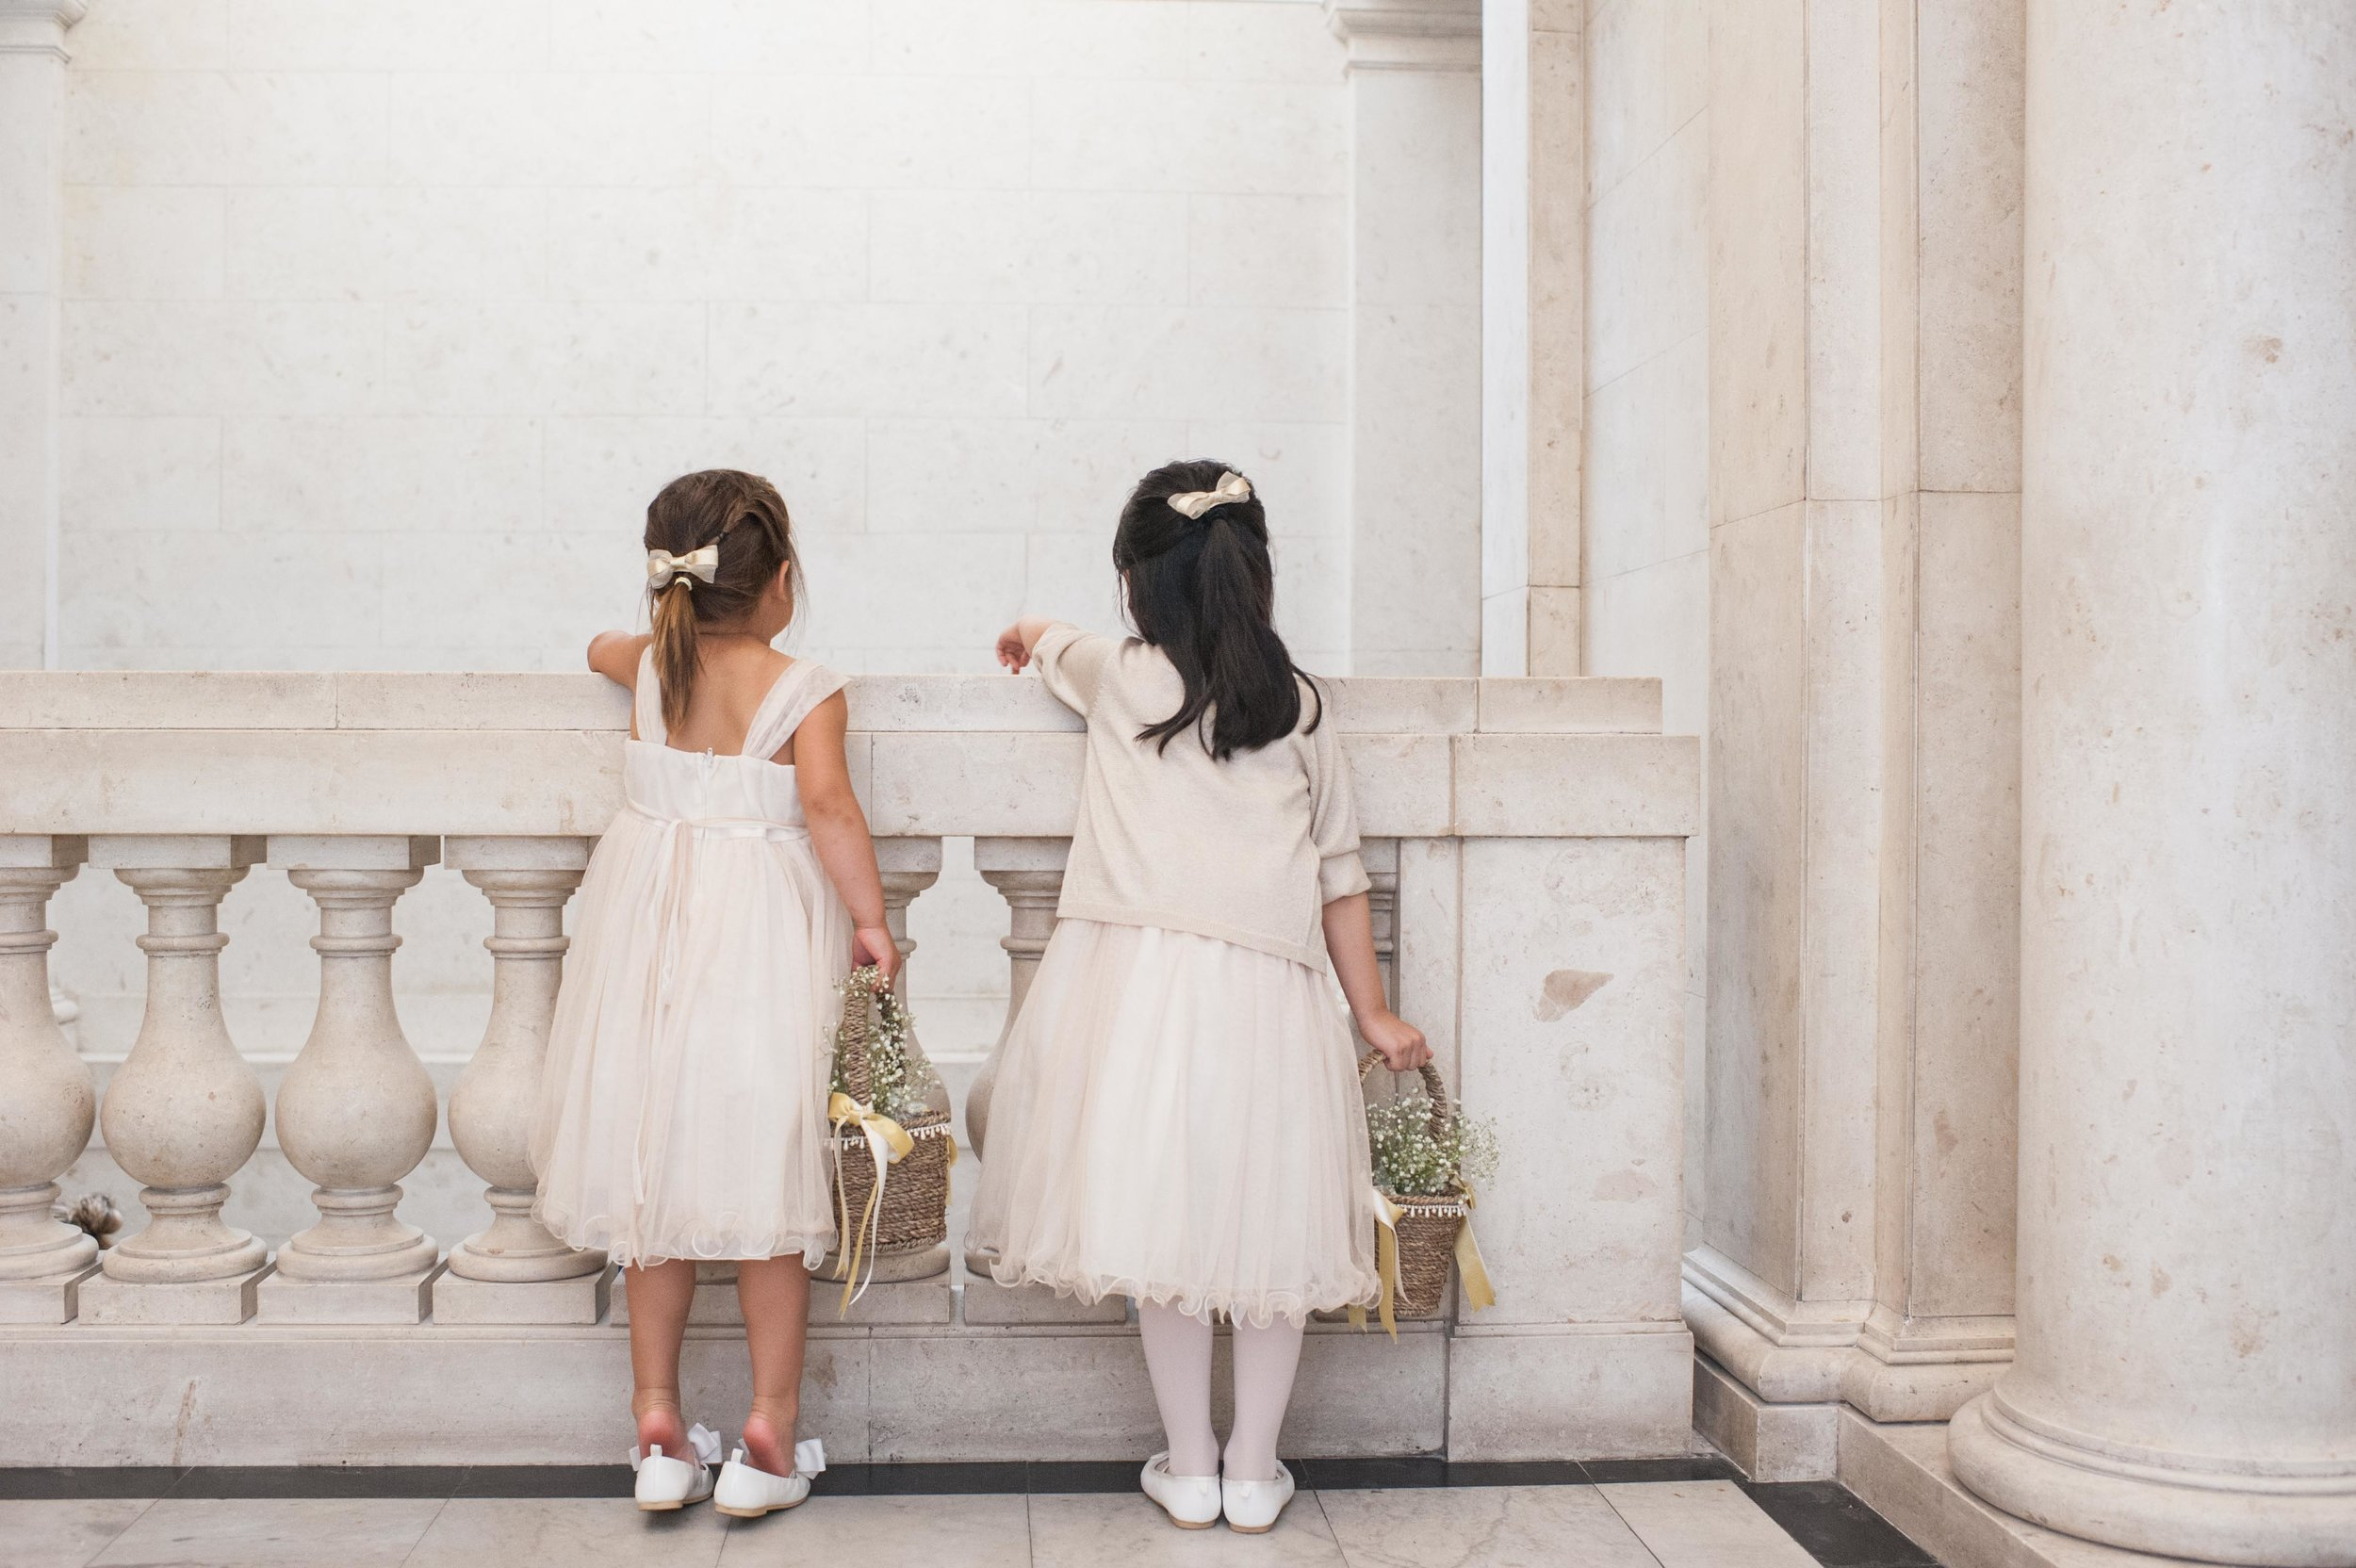 D&M_Marylebone Town Hall Wedding (121 of 239).jpg